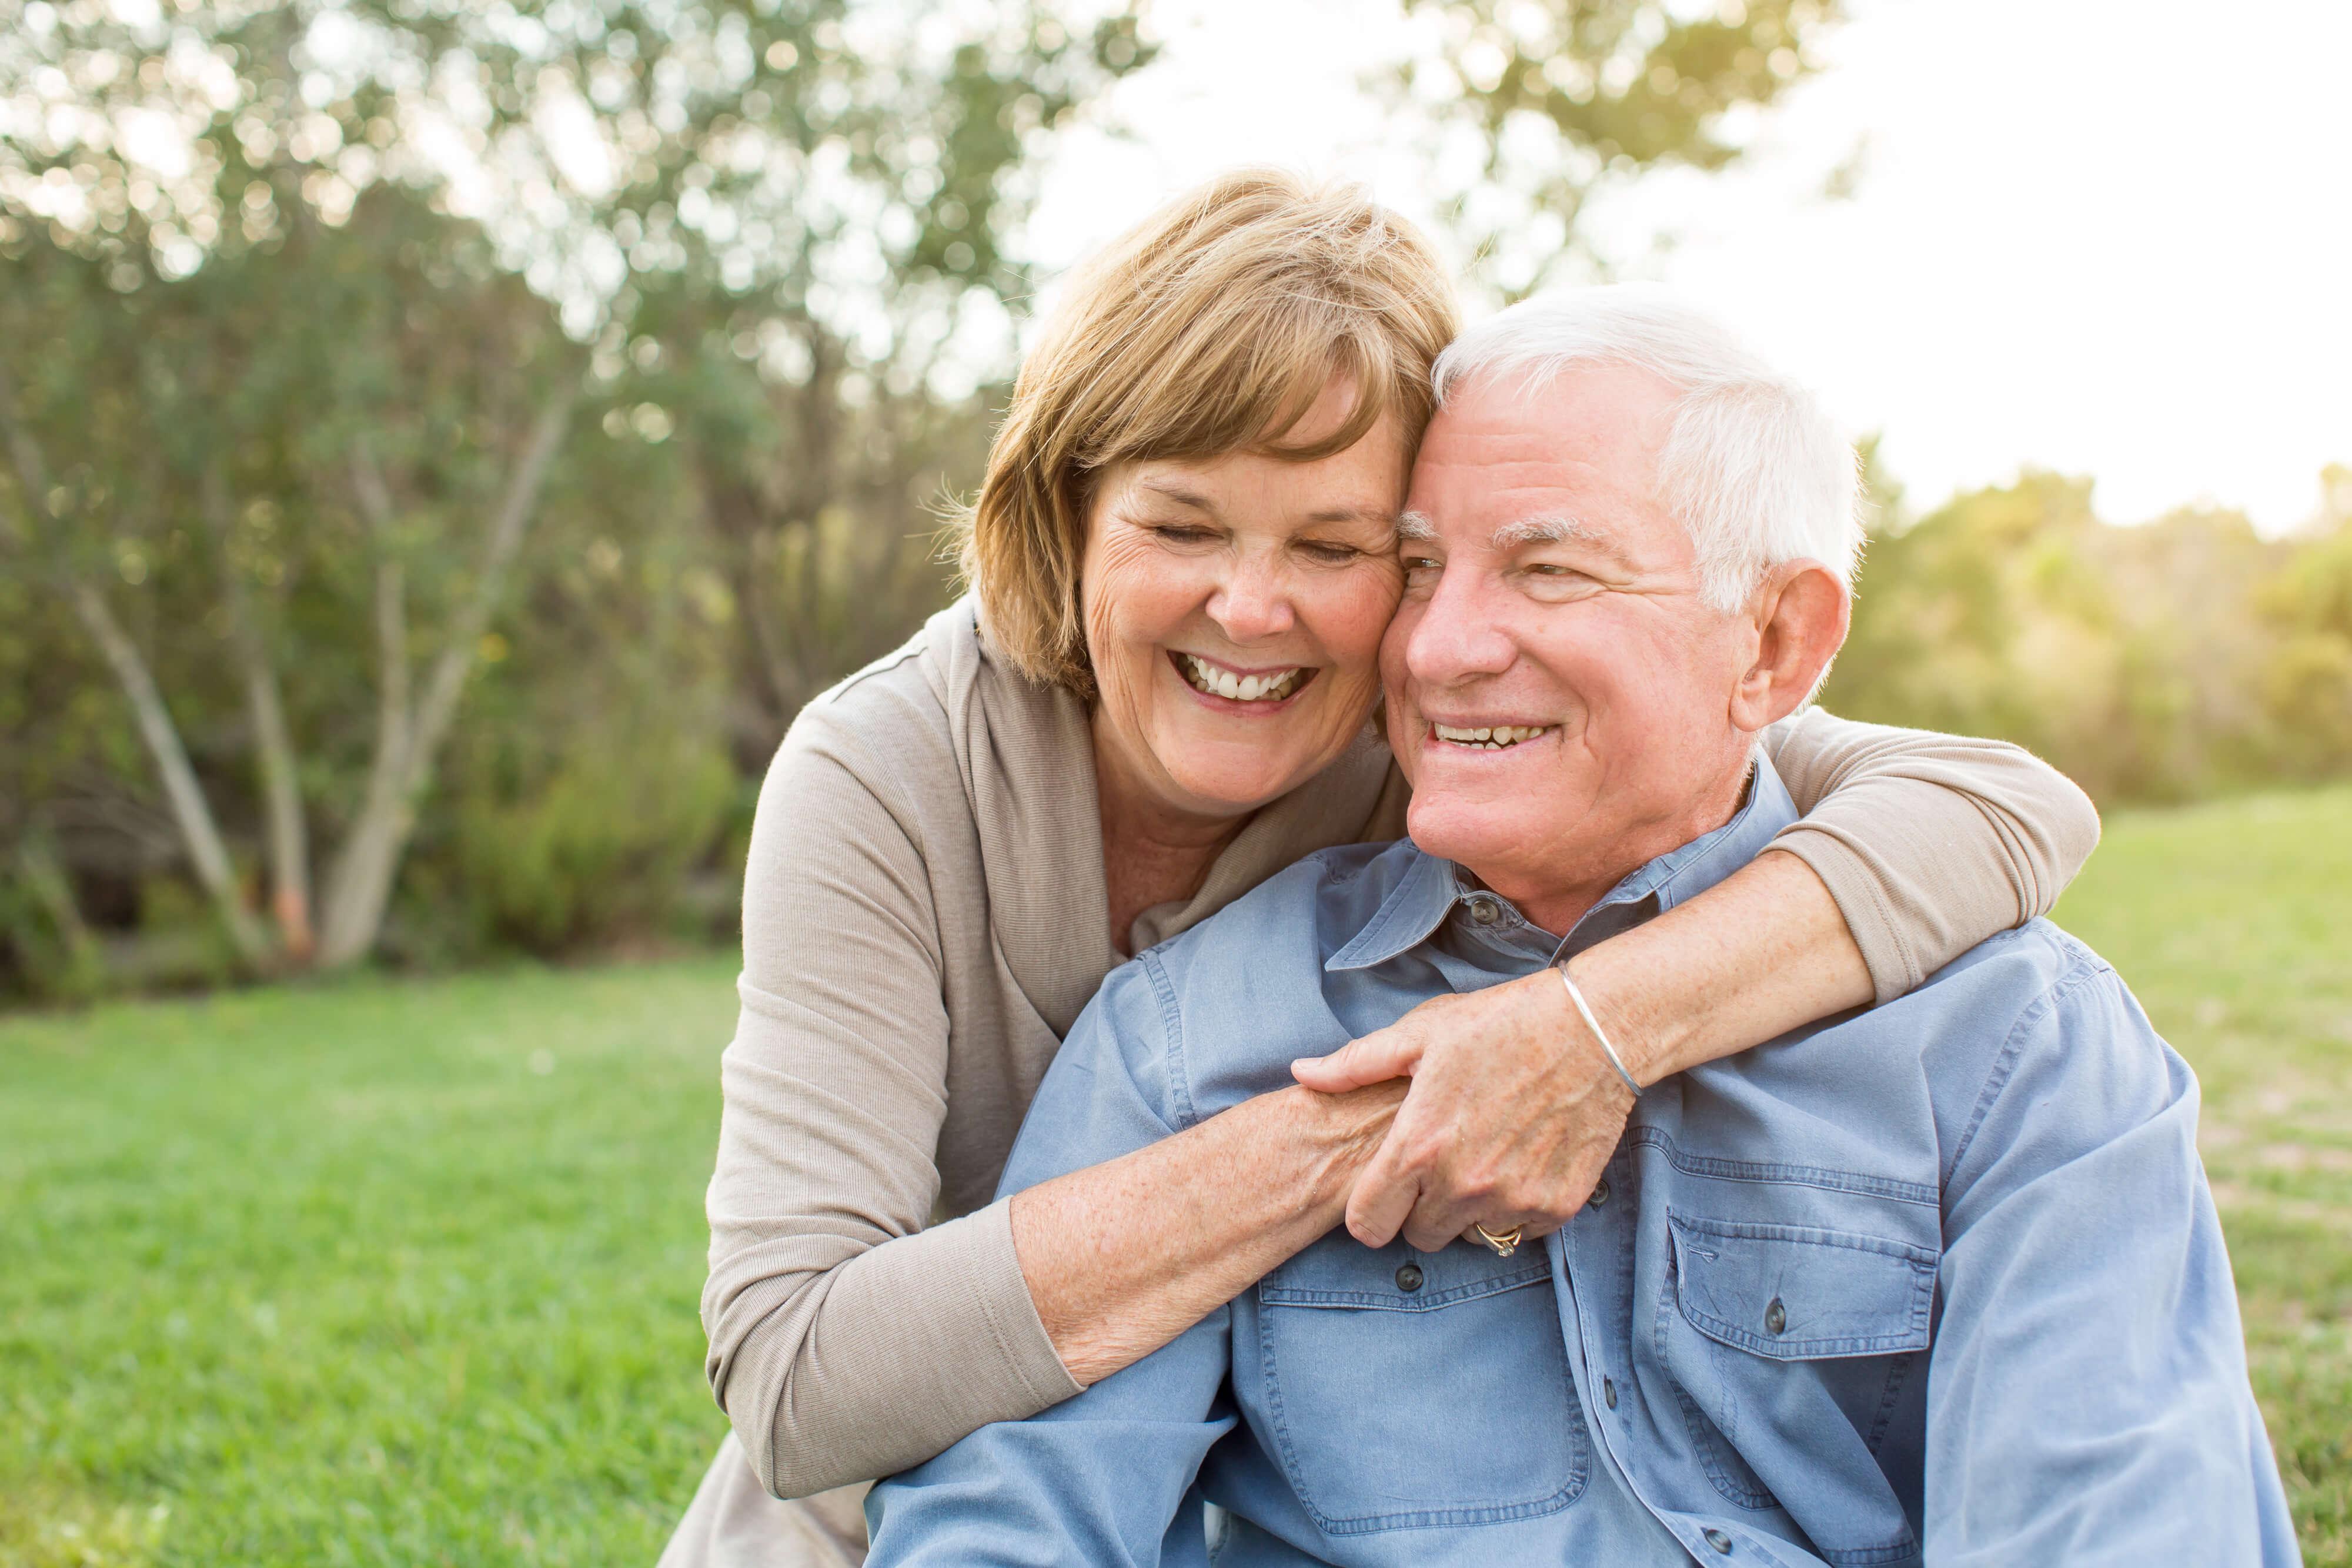 Life Insurance from Hempkins Insurance